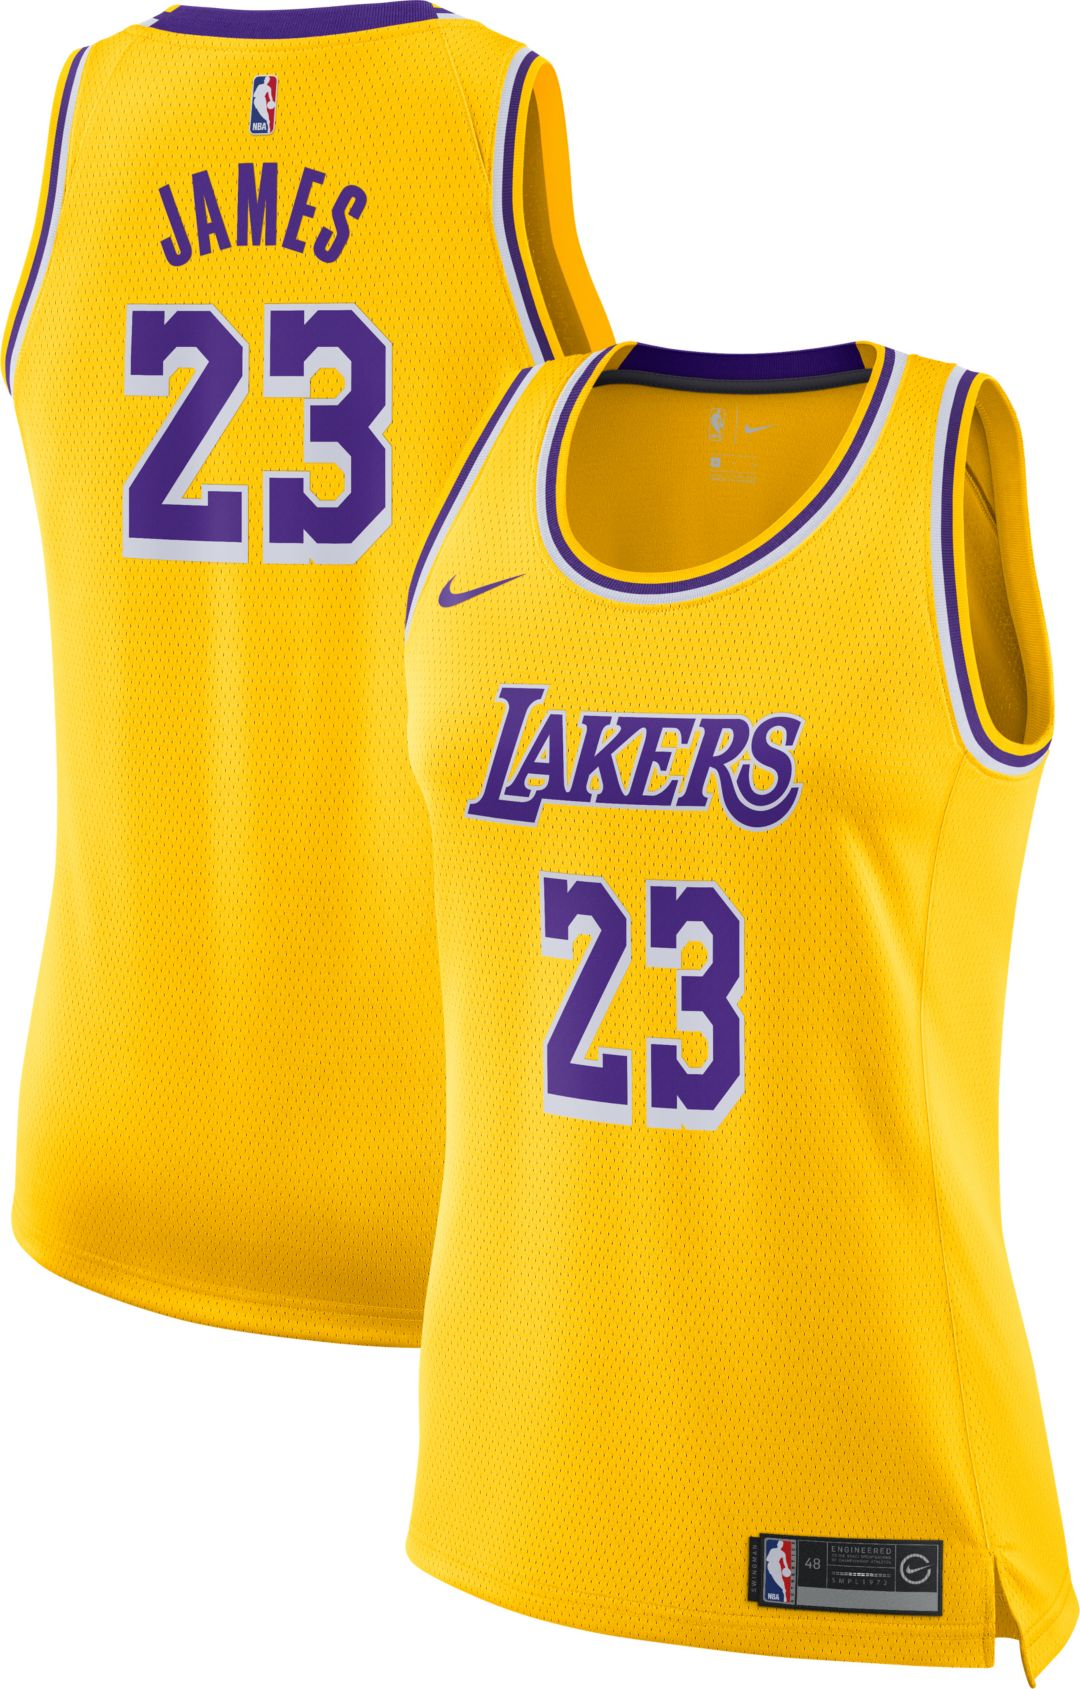 sale retailer 29622 88a73 Nike Women's Los Angeles Lakers LeBron James #23 Gold Dri-FIT Swingman  Jersey